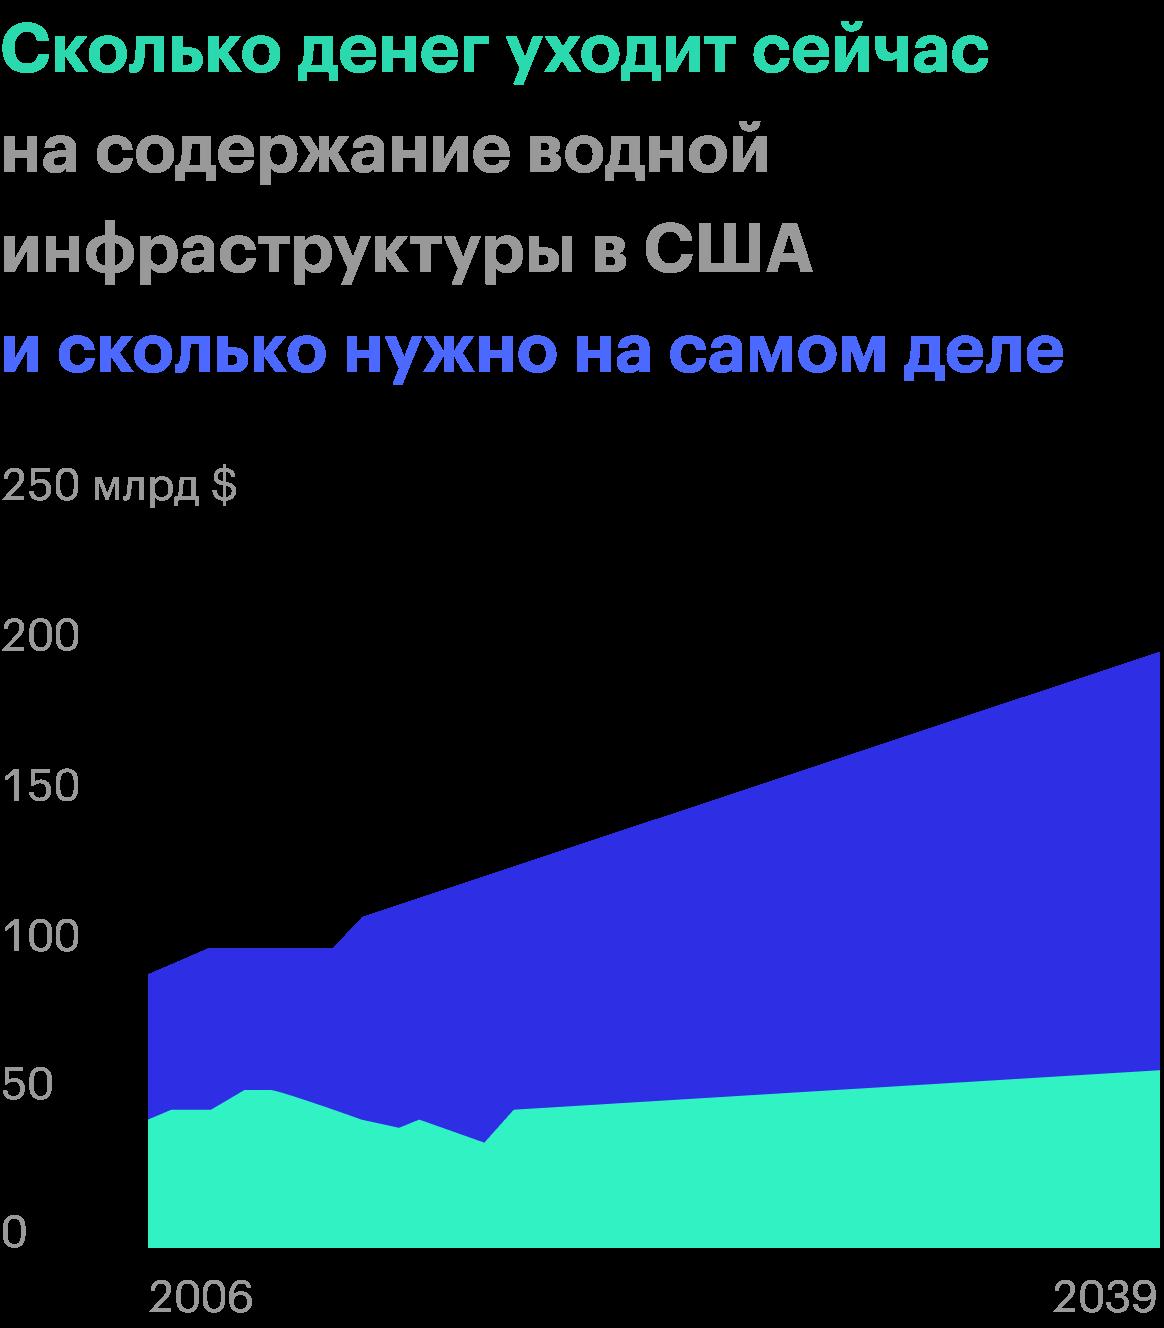 Источник: доклад US Water Alliance, стр.13(15)